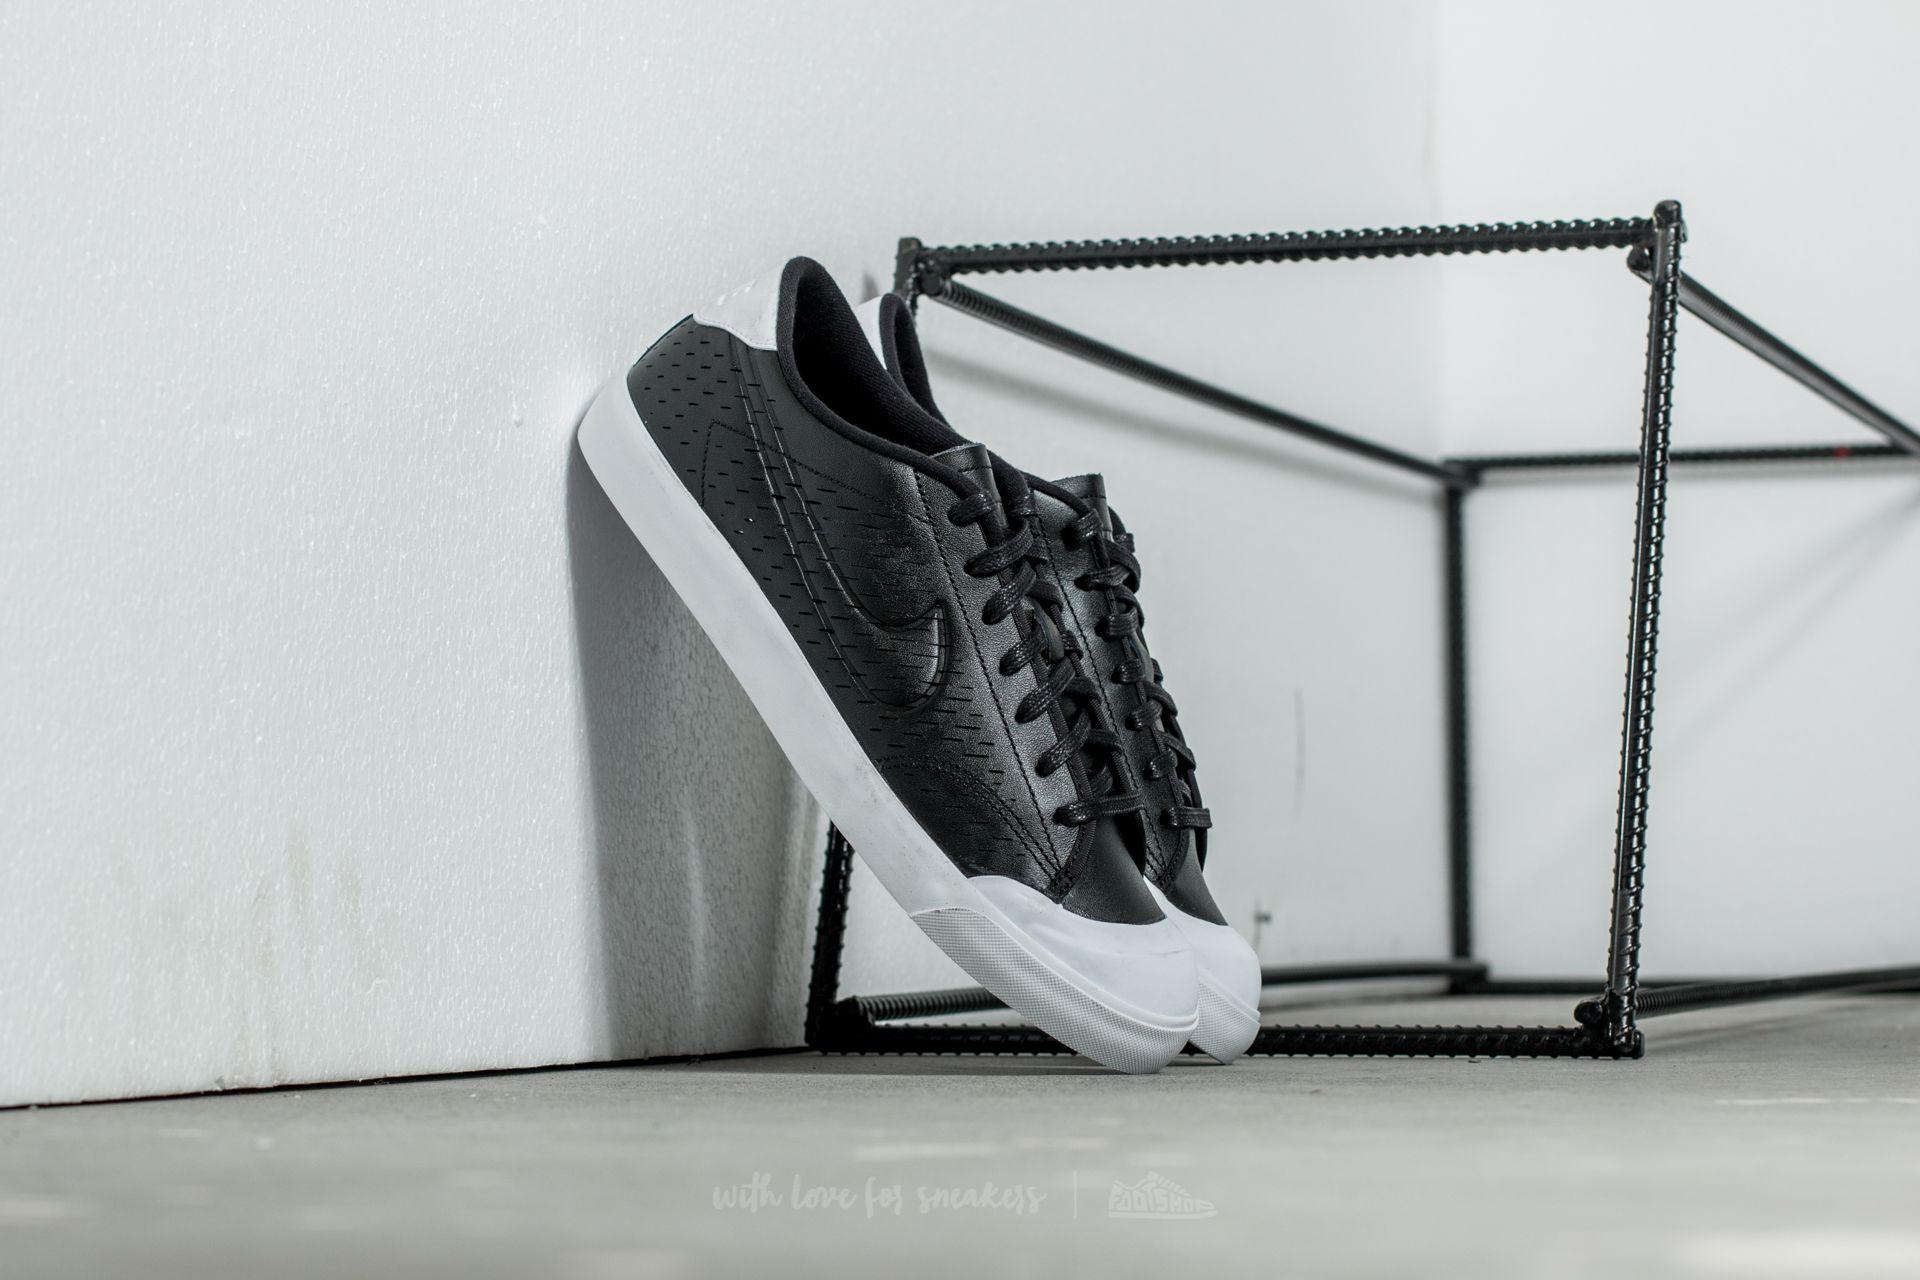 Cerdo gemelo Conejo  Men's shoes Nike All Court 2 Low Leather Black/ Black-White